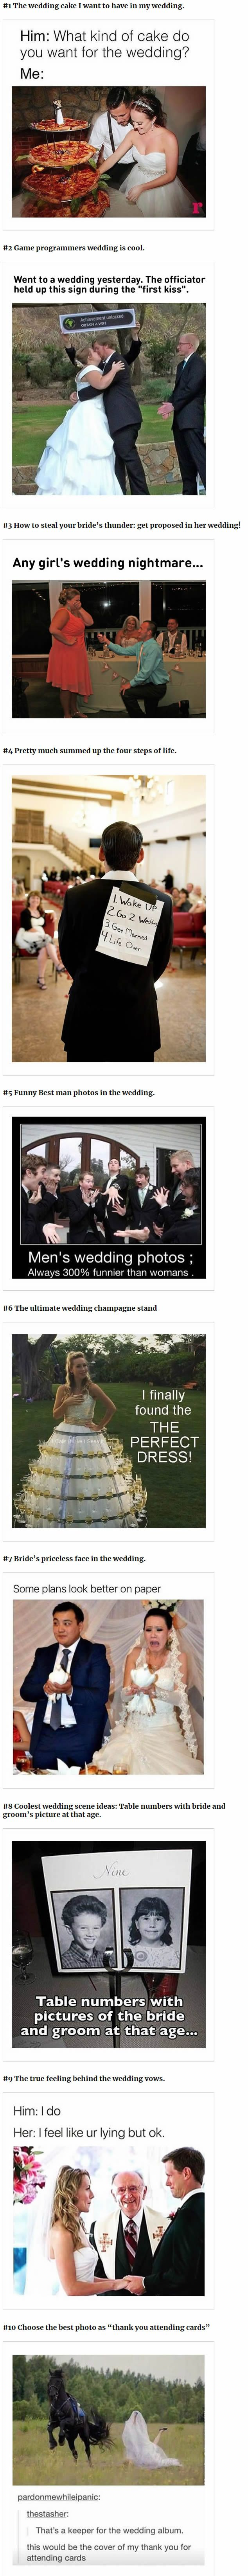 wedding memes coolest wedding scene ideas table numbers